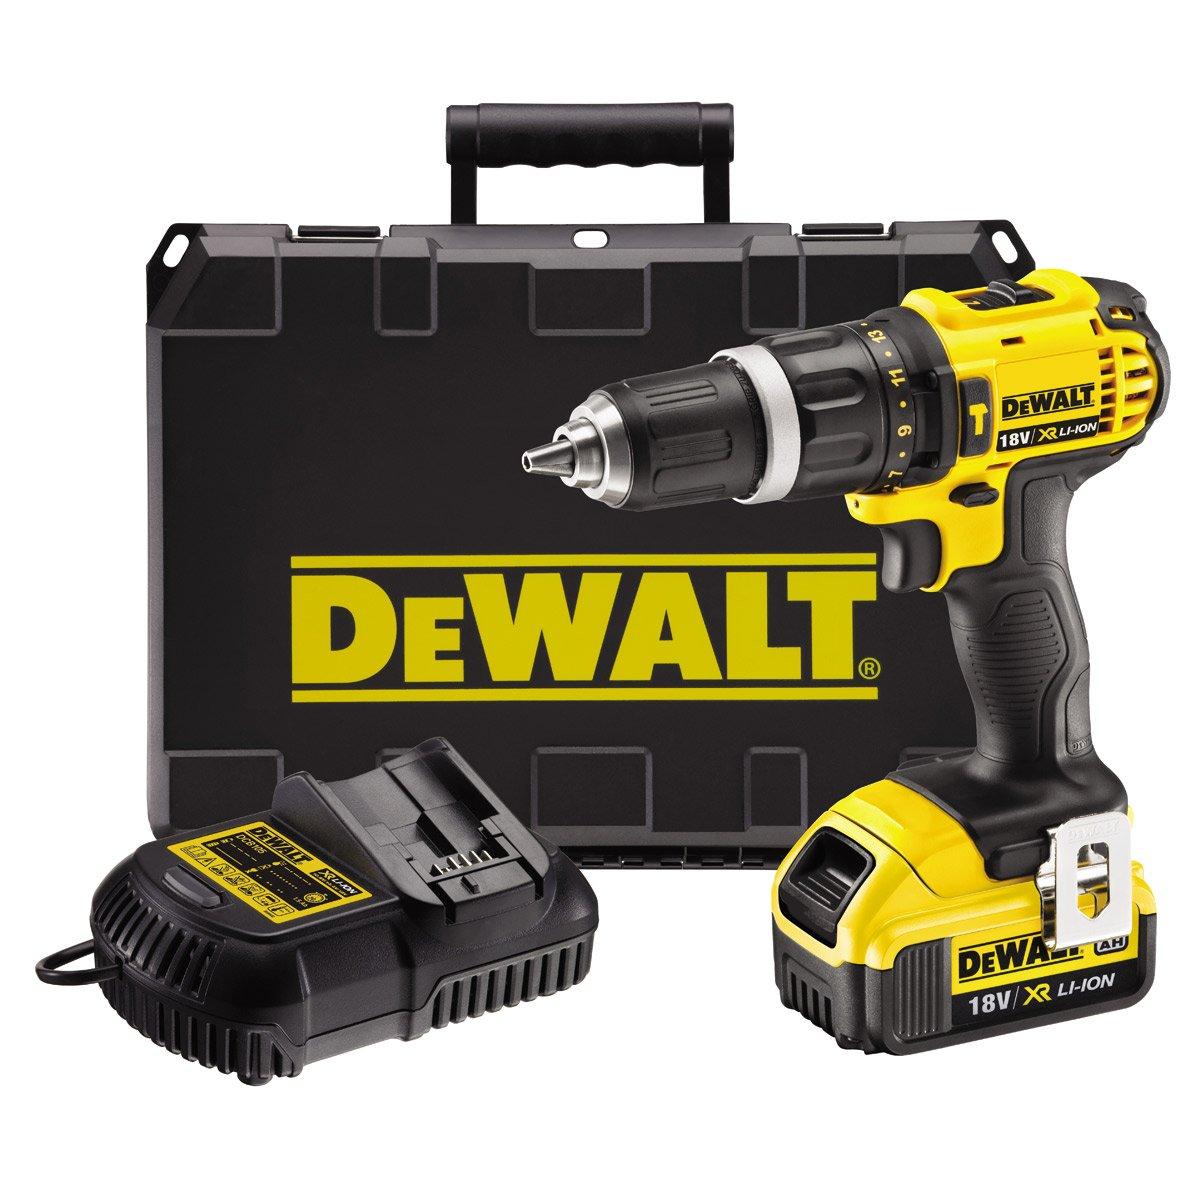 DeWalt 18V XR Combi Drill